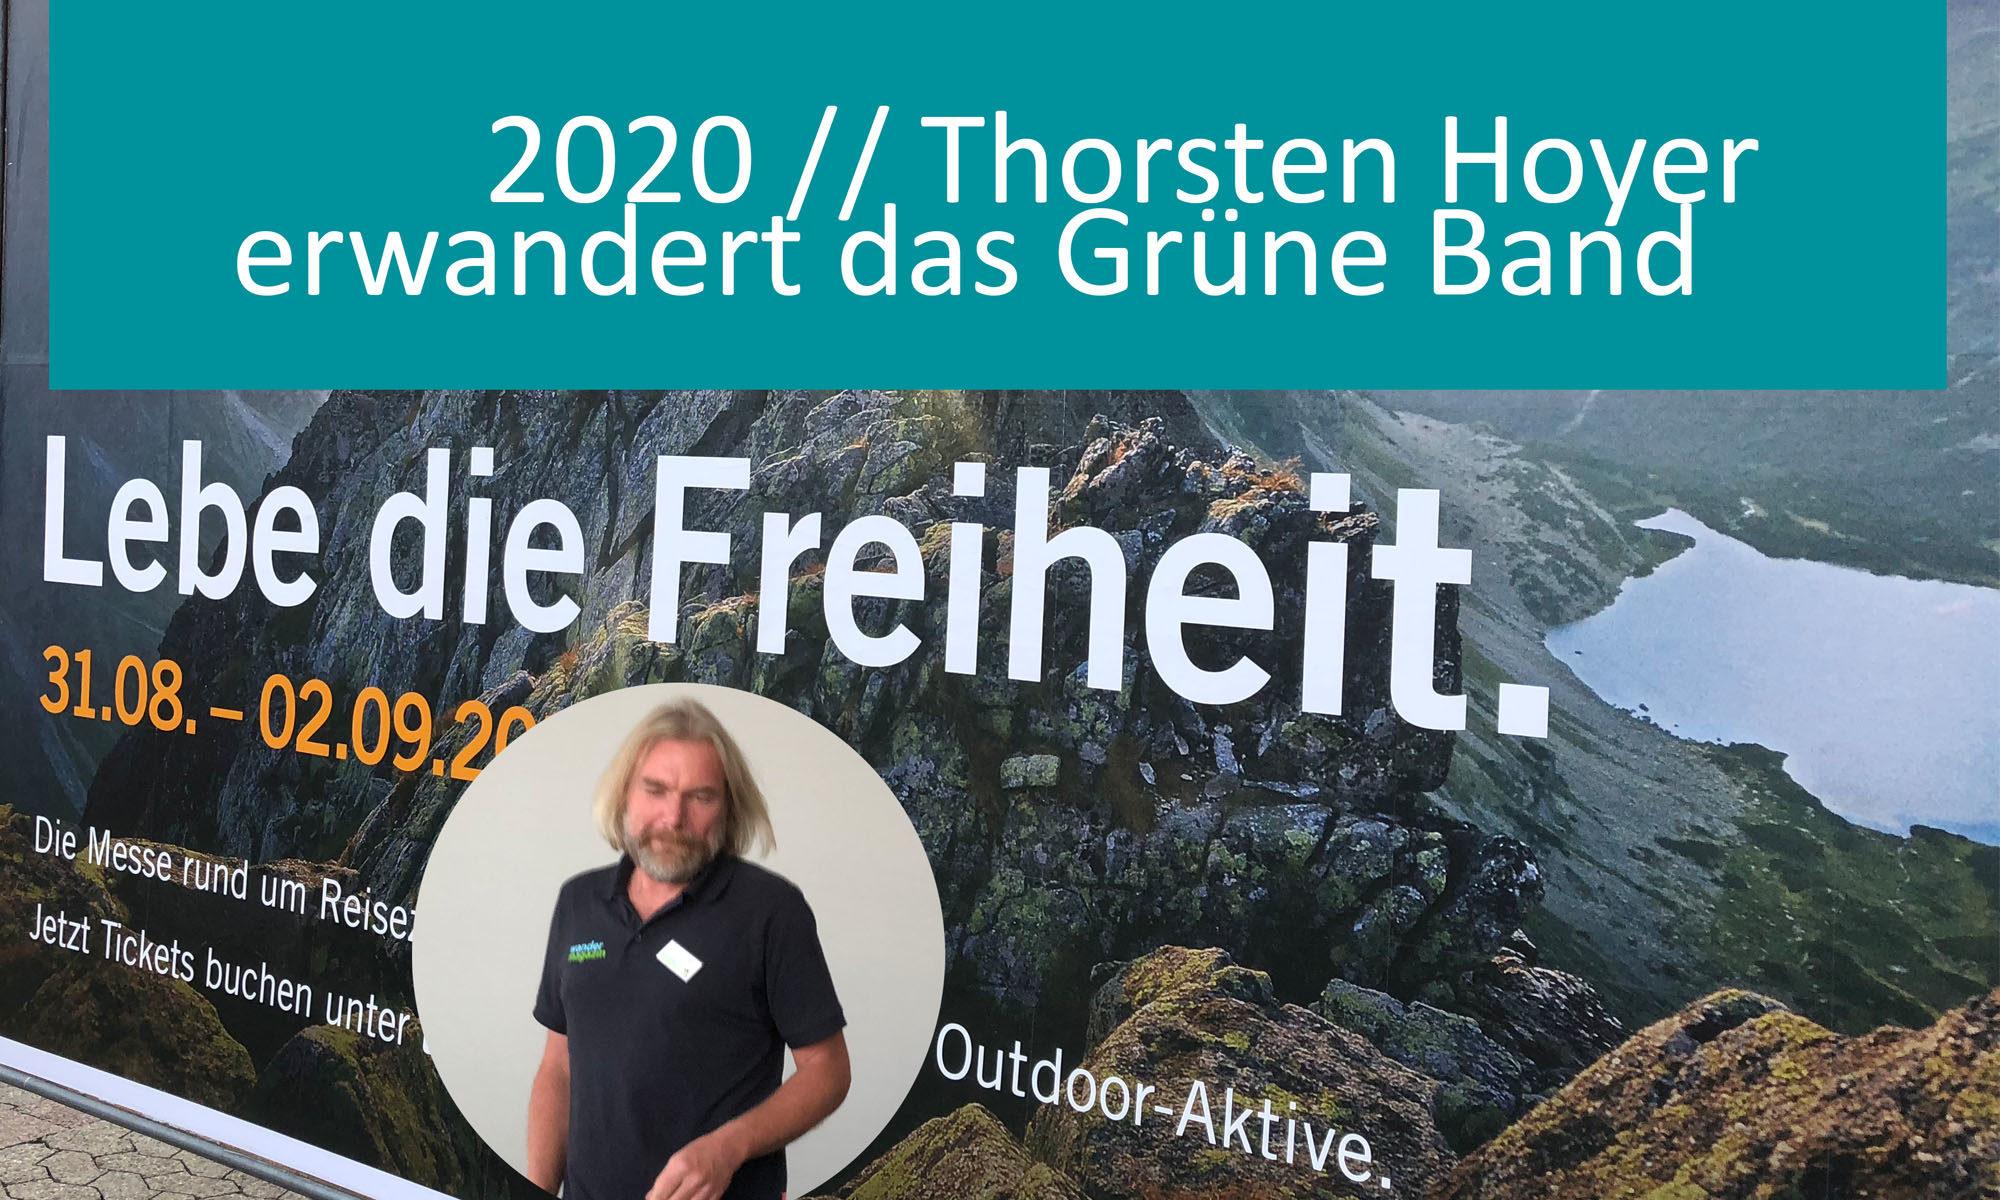 Thorsten Hoyer erwandert das Grüne Band